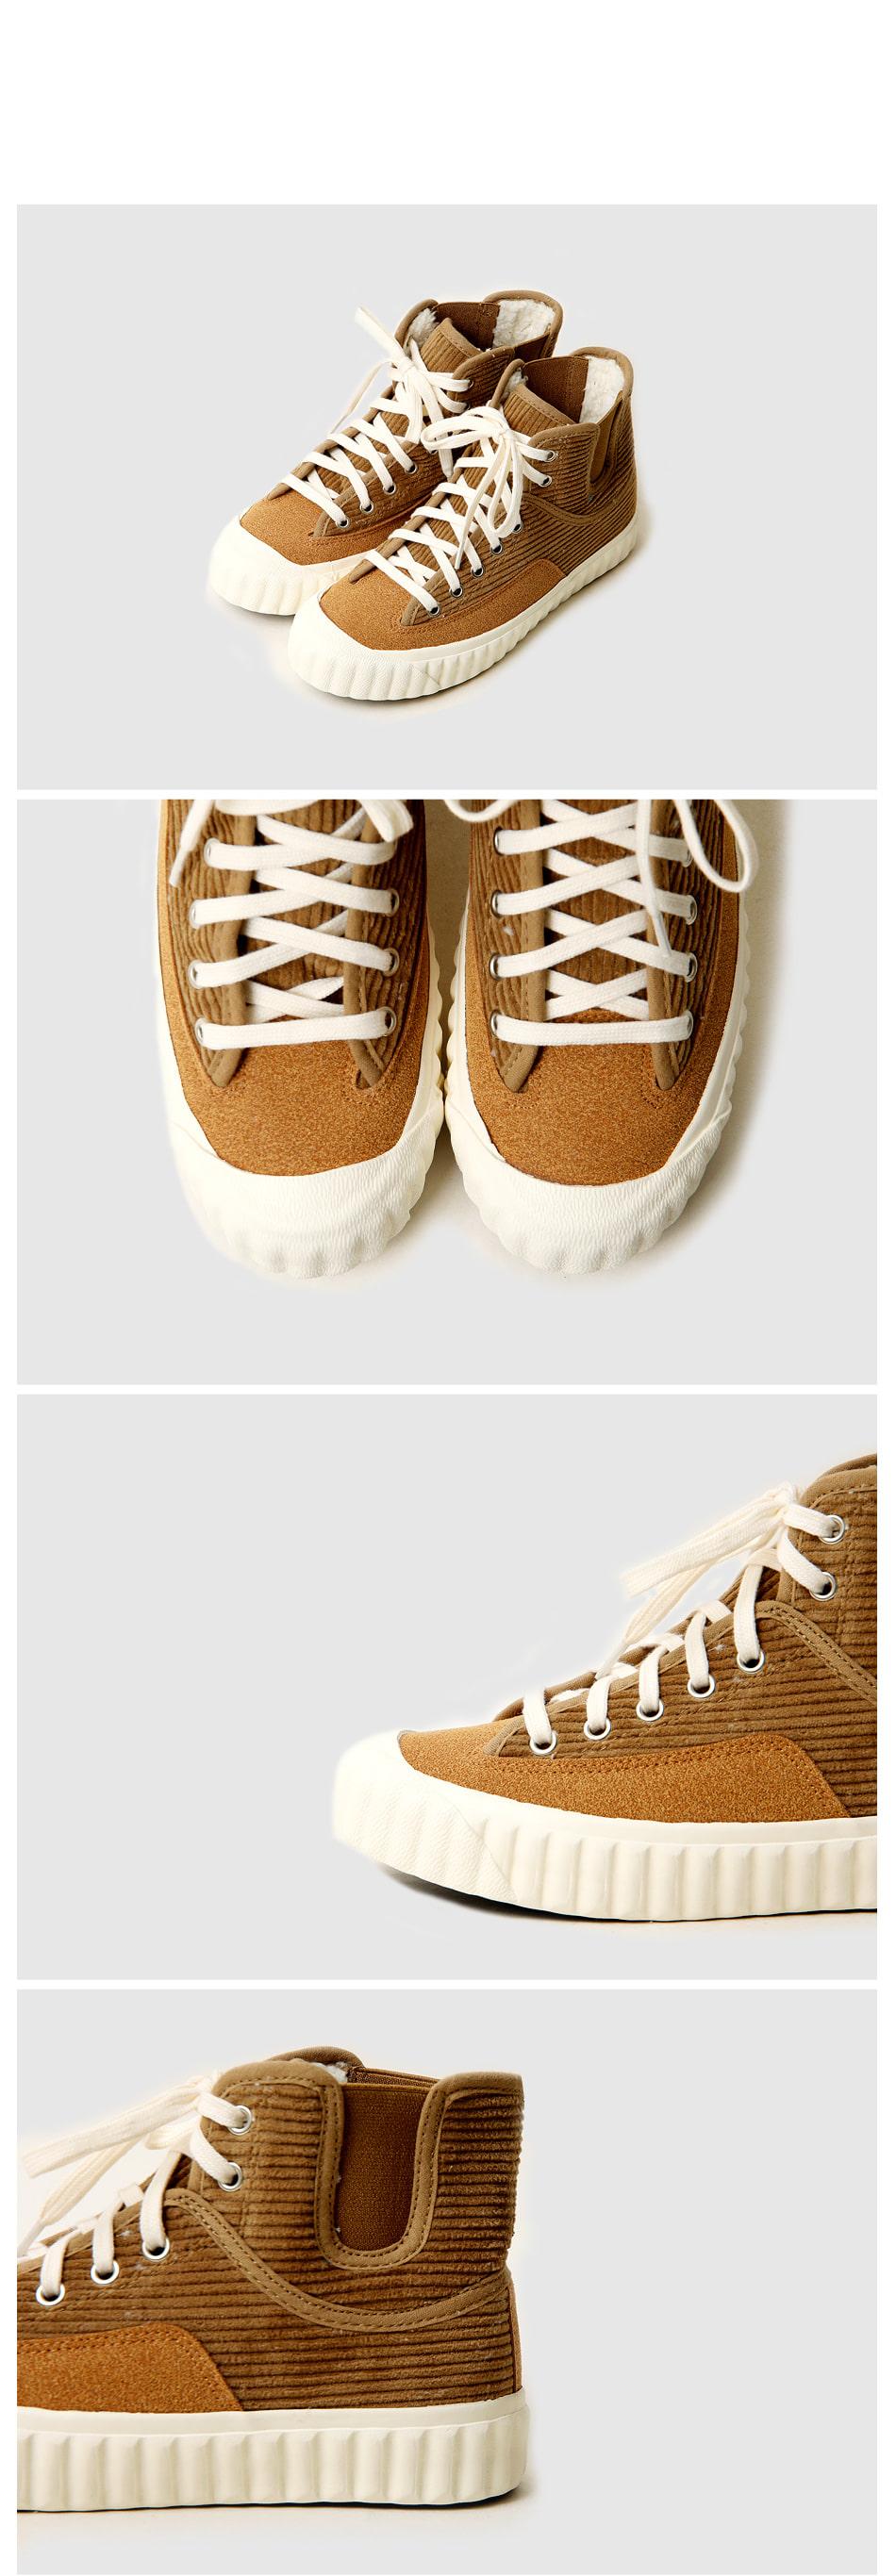 Ethel high-top corduroy sneakers 2cm